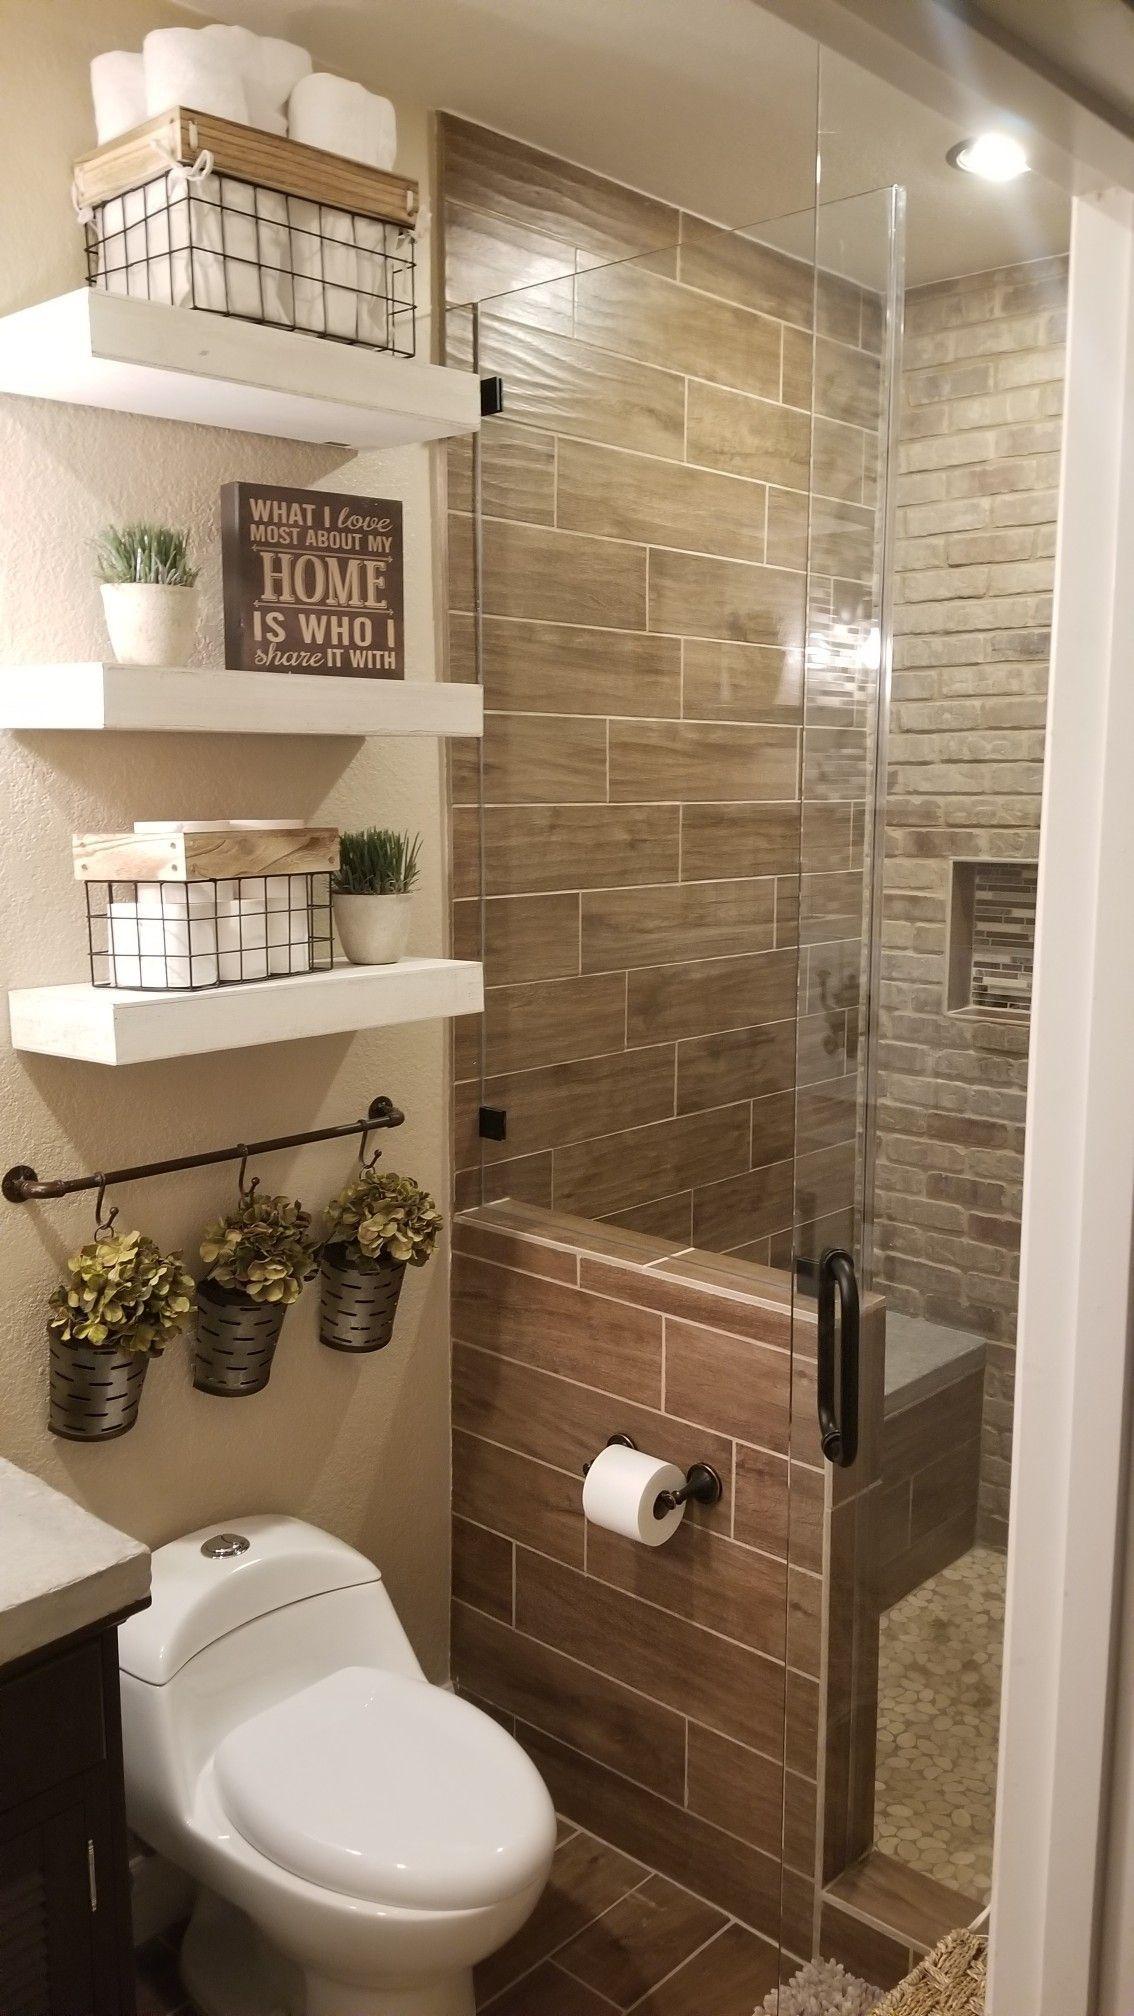 47 Small Bathroom Ideas With Images Bathroom Decor Apartment